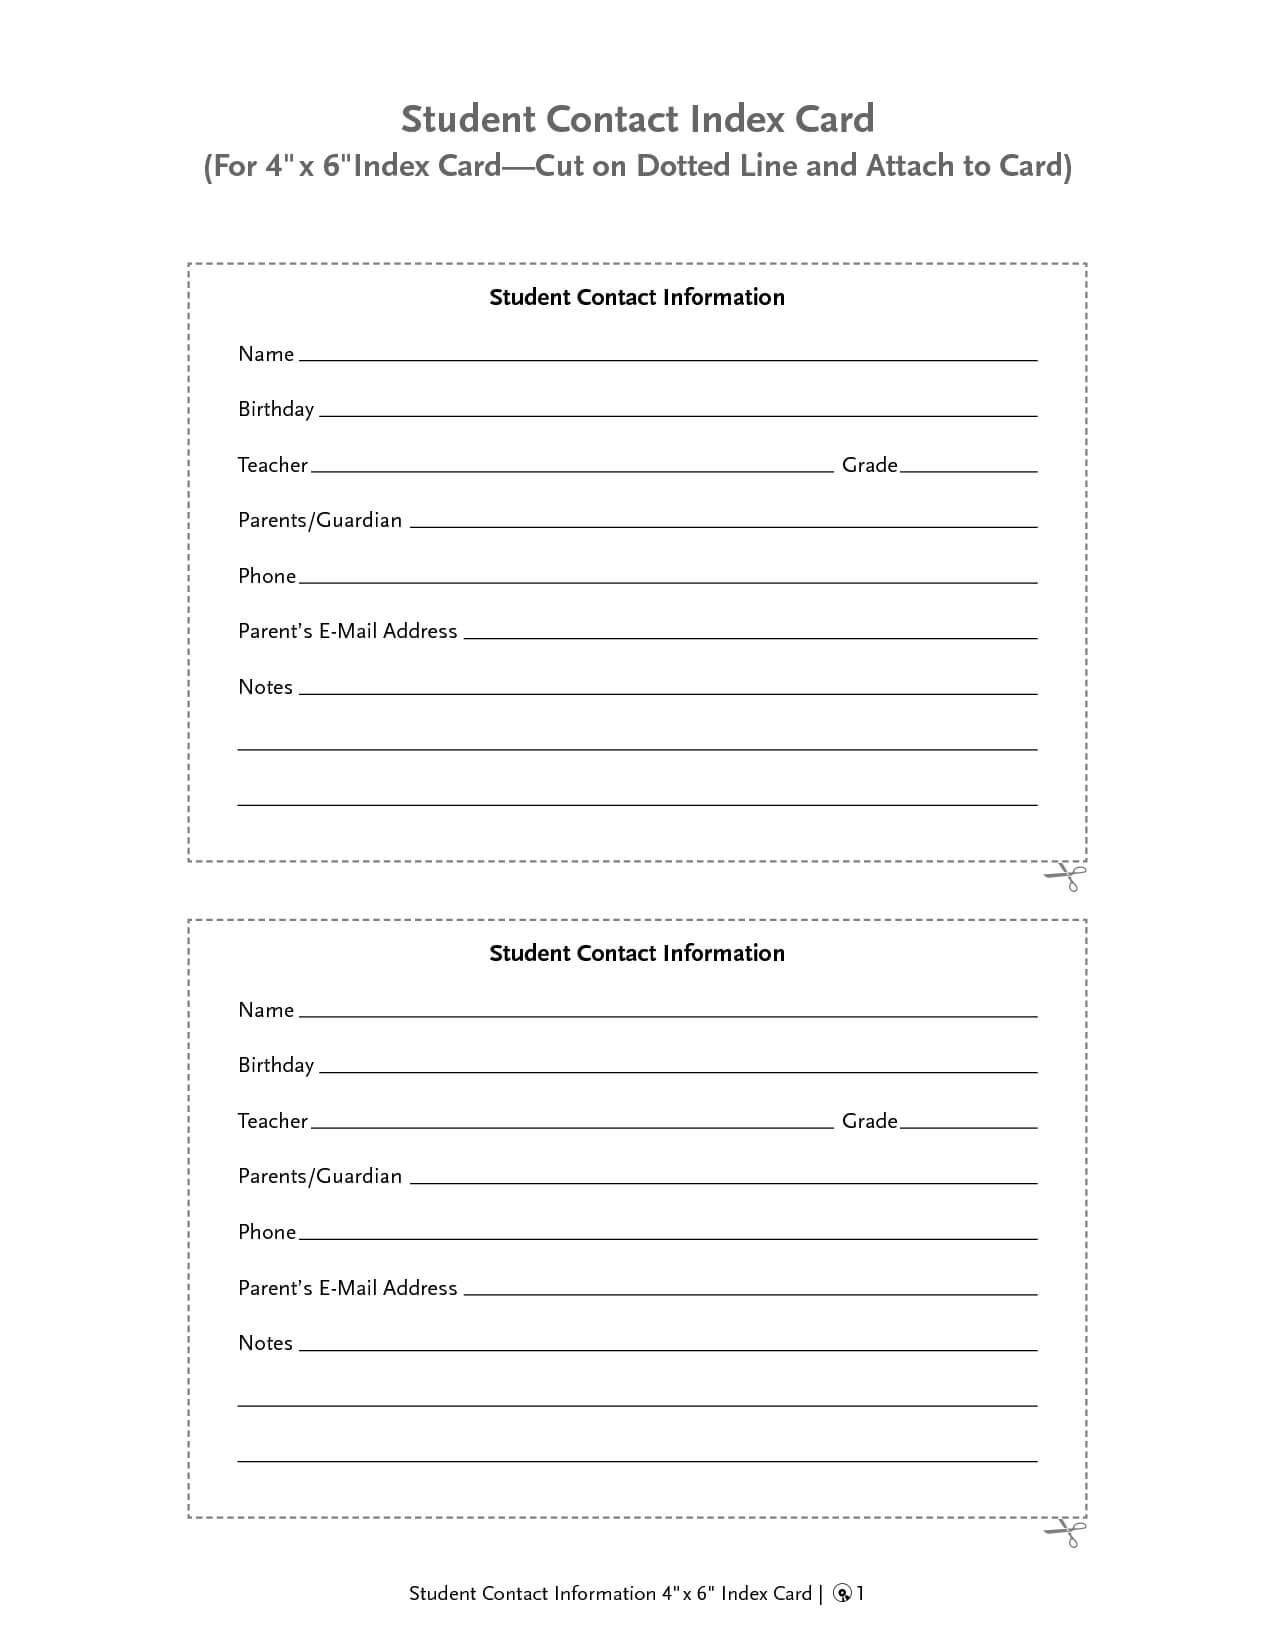 Customer Information Card Template - Atlantaauctionco Inside Customer Information Card Template